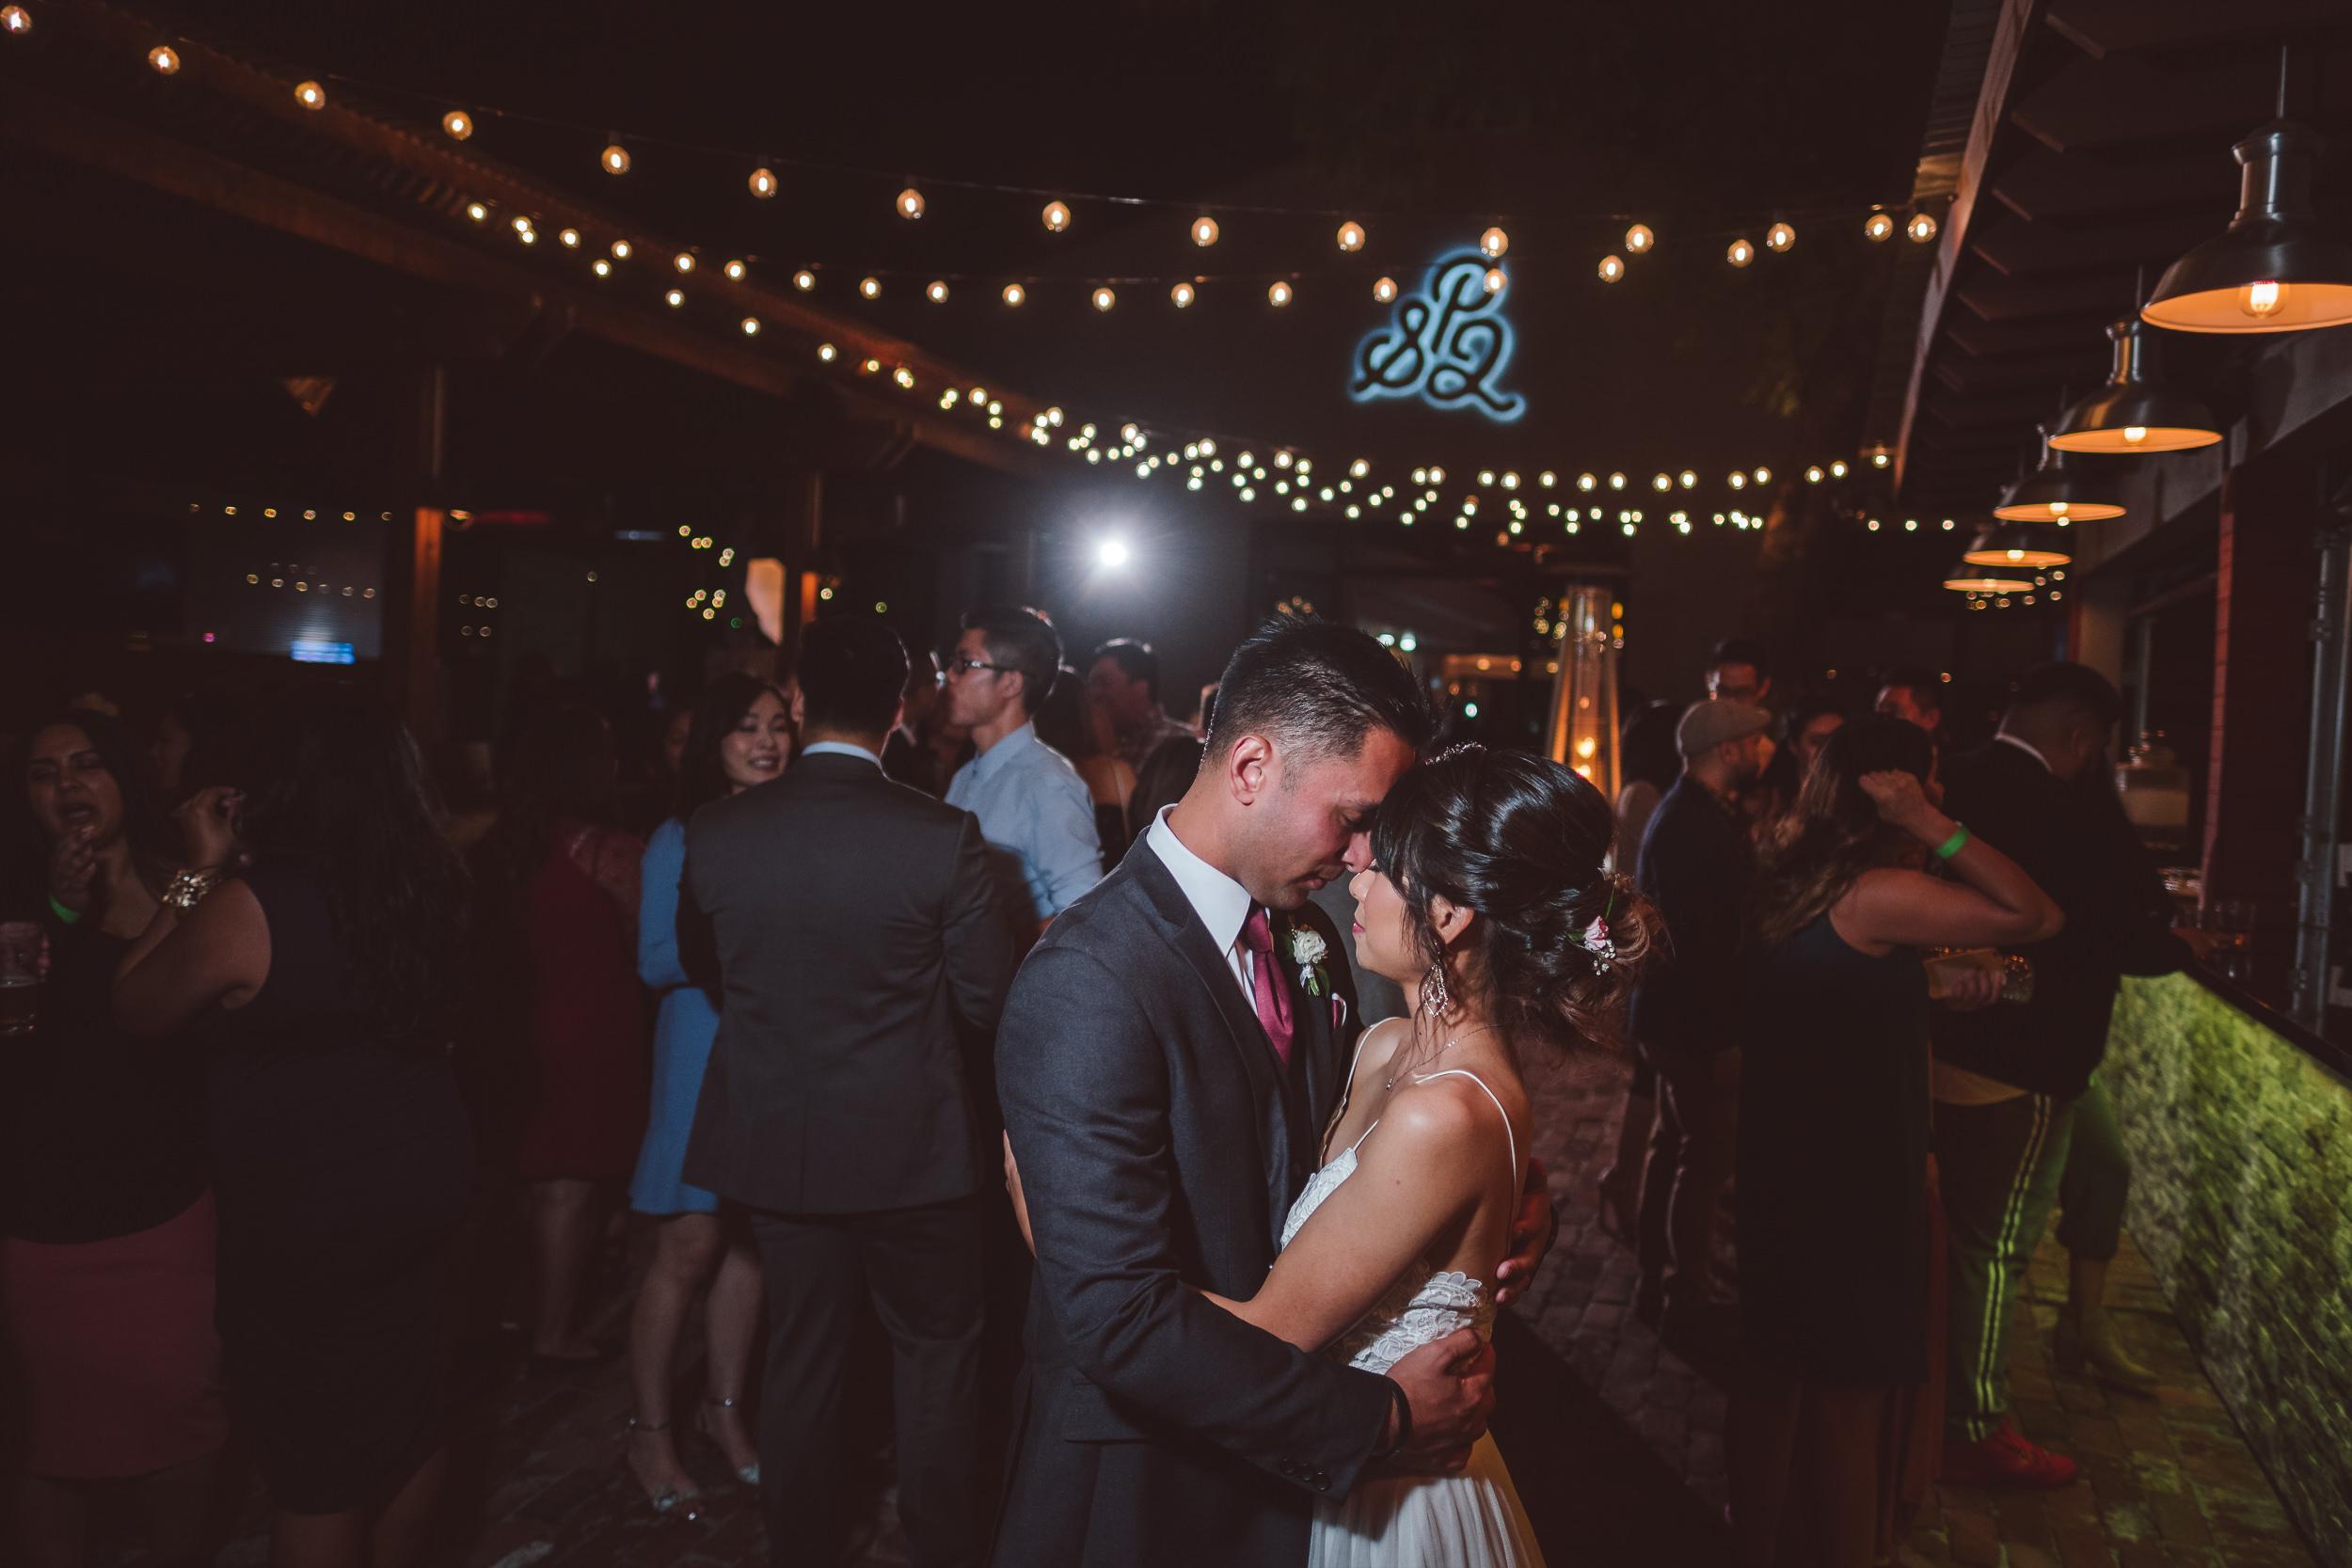 San-Francisco-City-Hall-Wedding-Photography-098.jpg